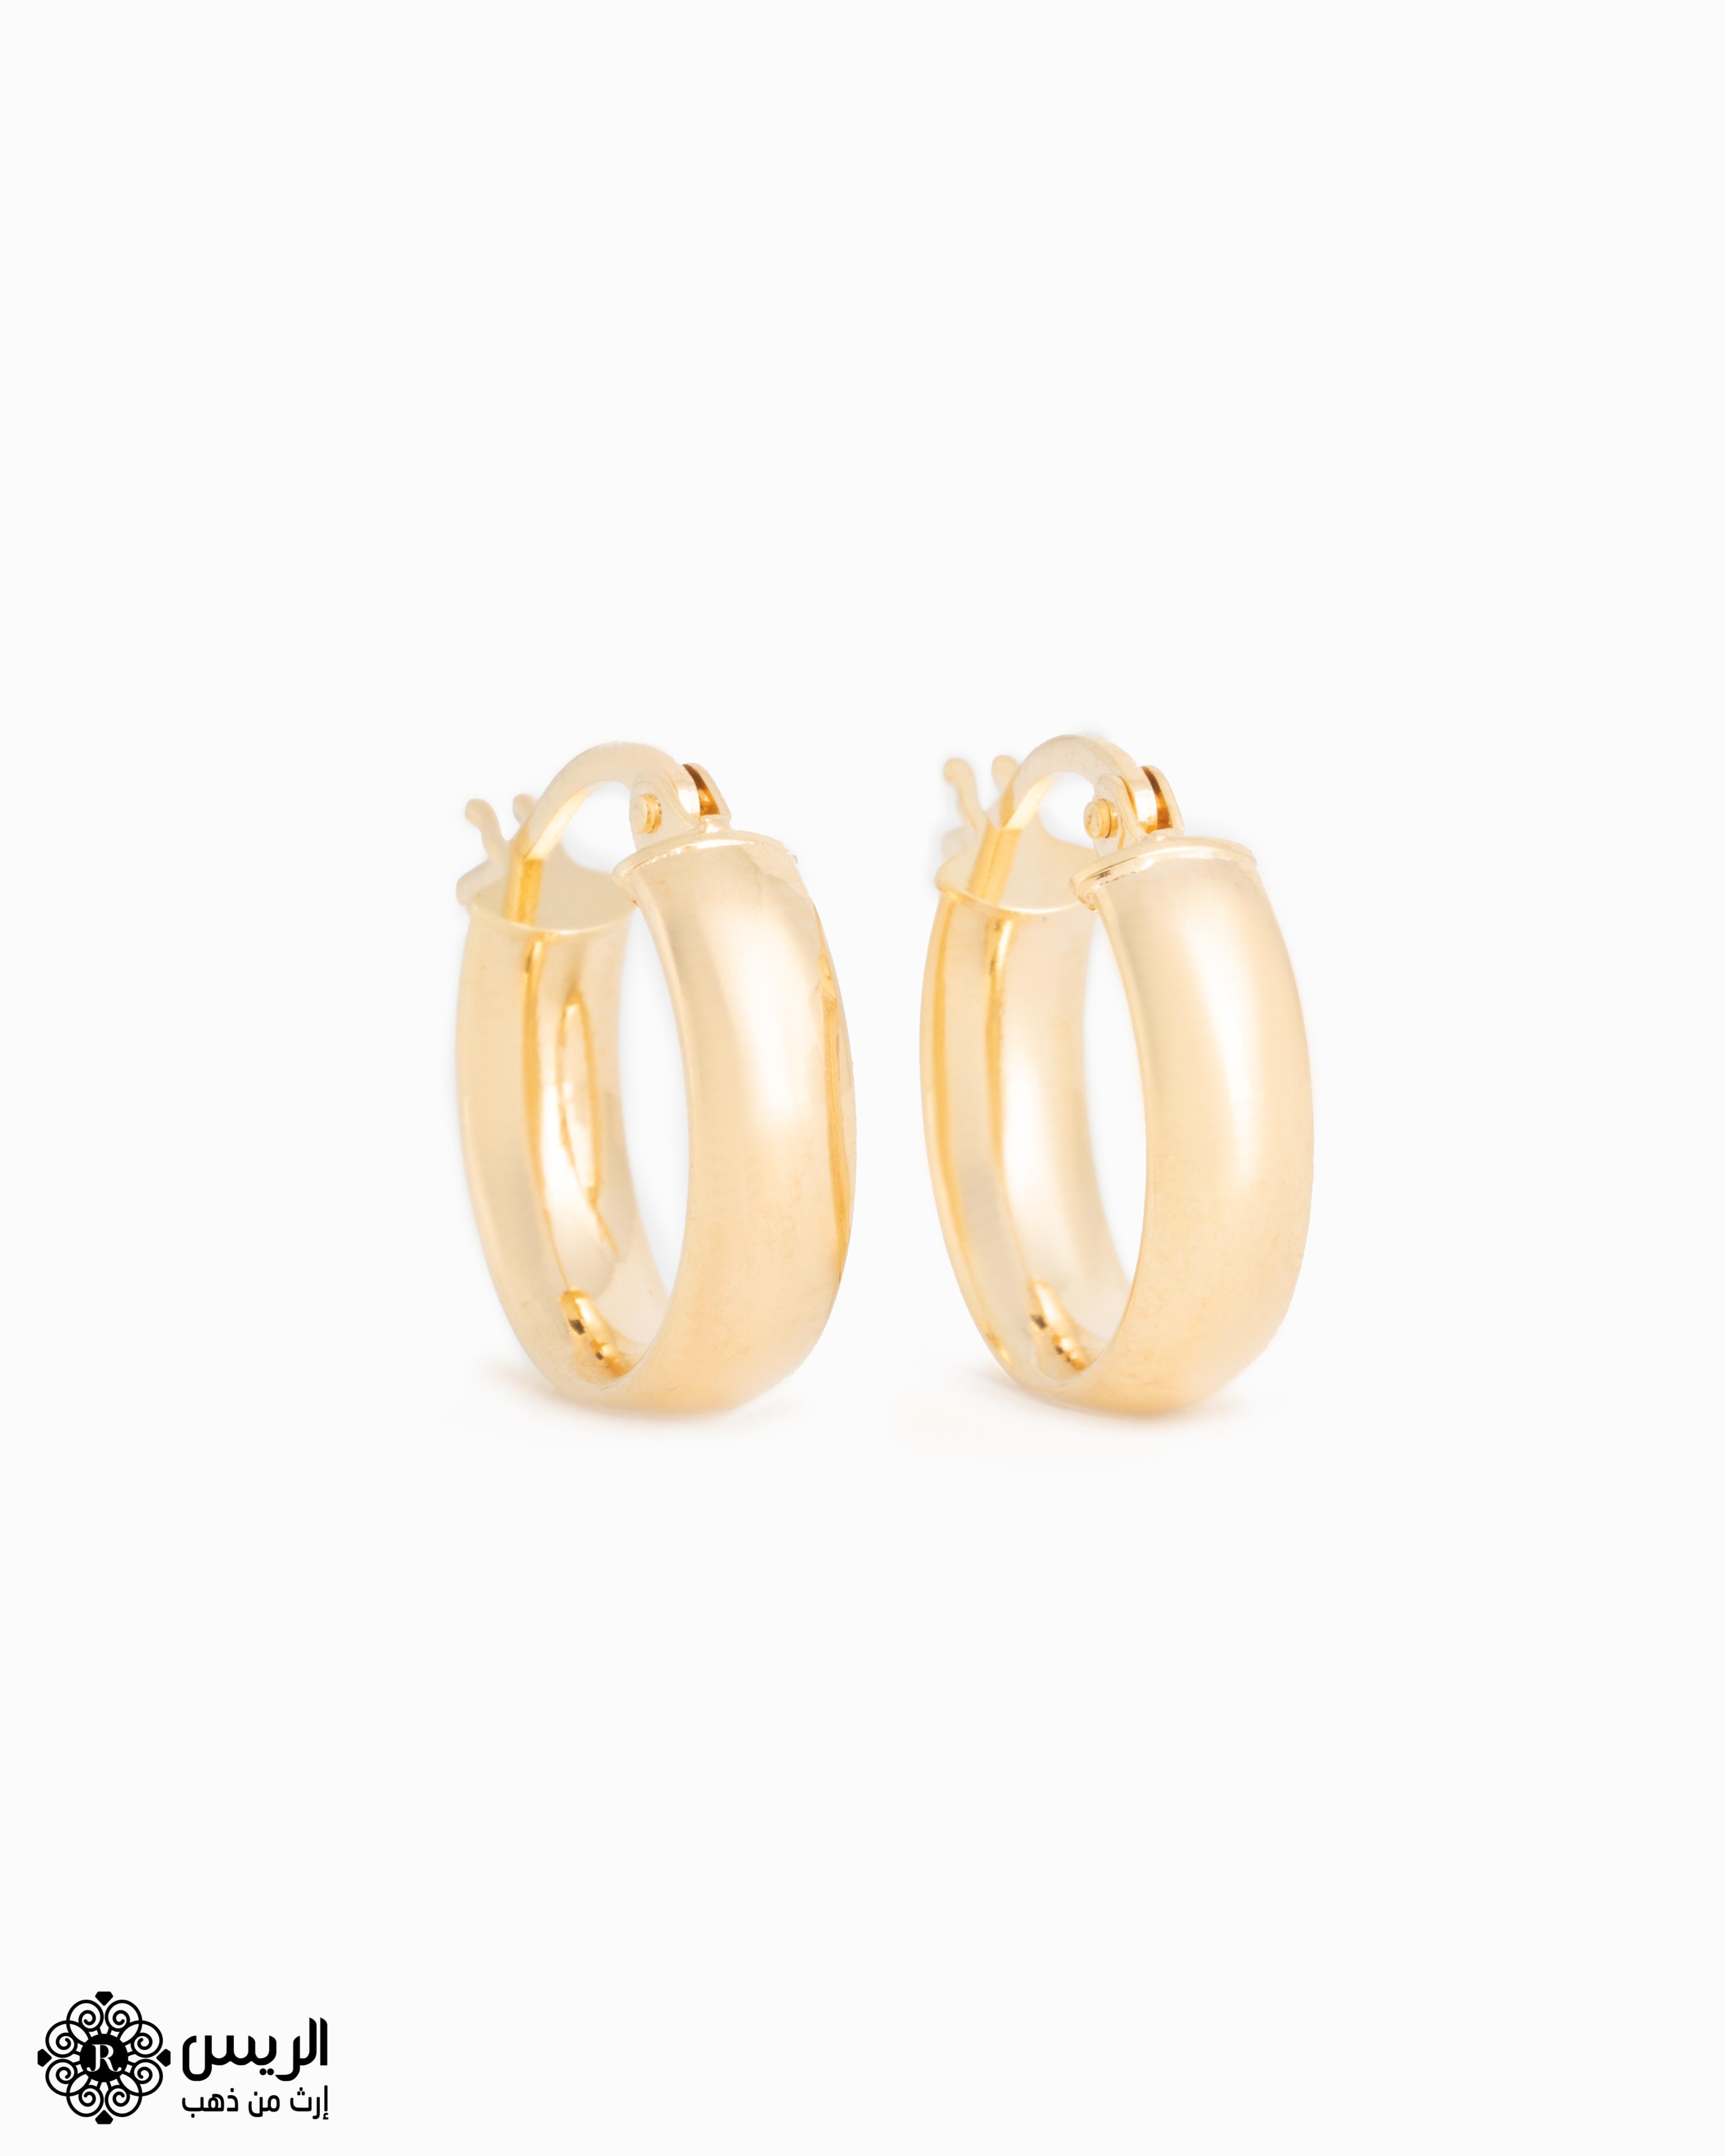 Raies jewelry Elegant Earrings حلق ناعم الريس للمجوهرات